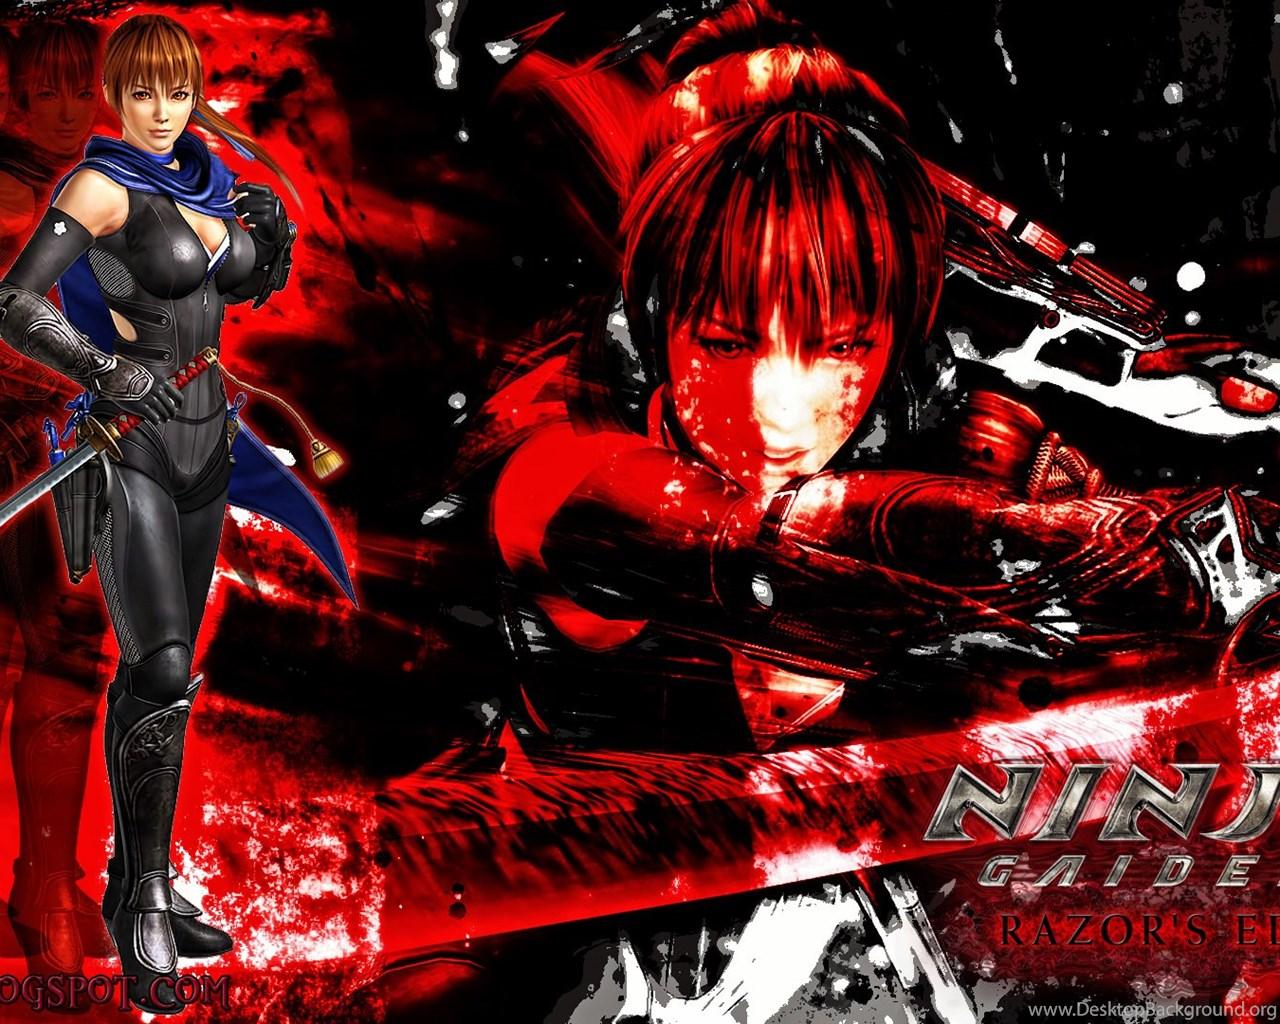 Games Movies Music Anime My Ninja Gaiden 3 Razor S Edge Kasumi Desktop Background